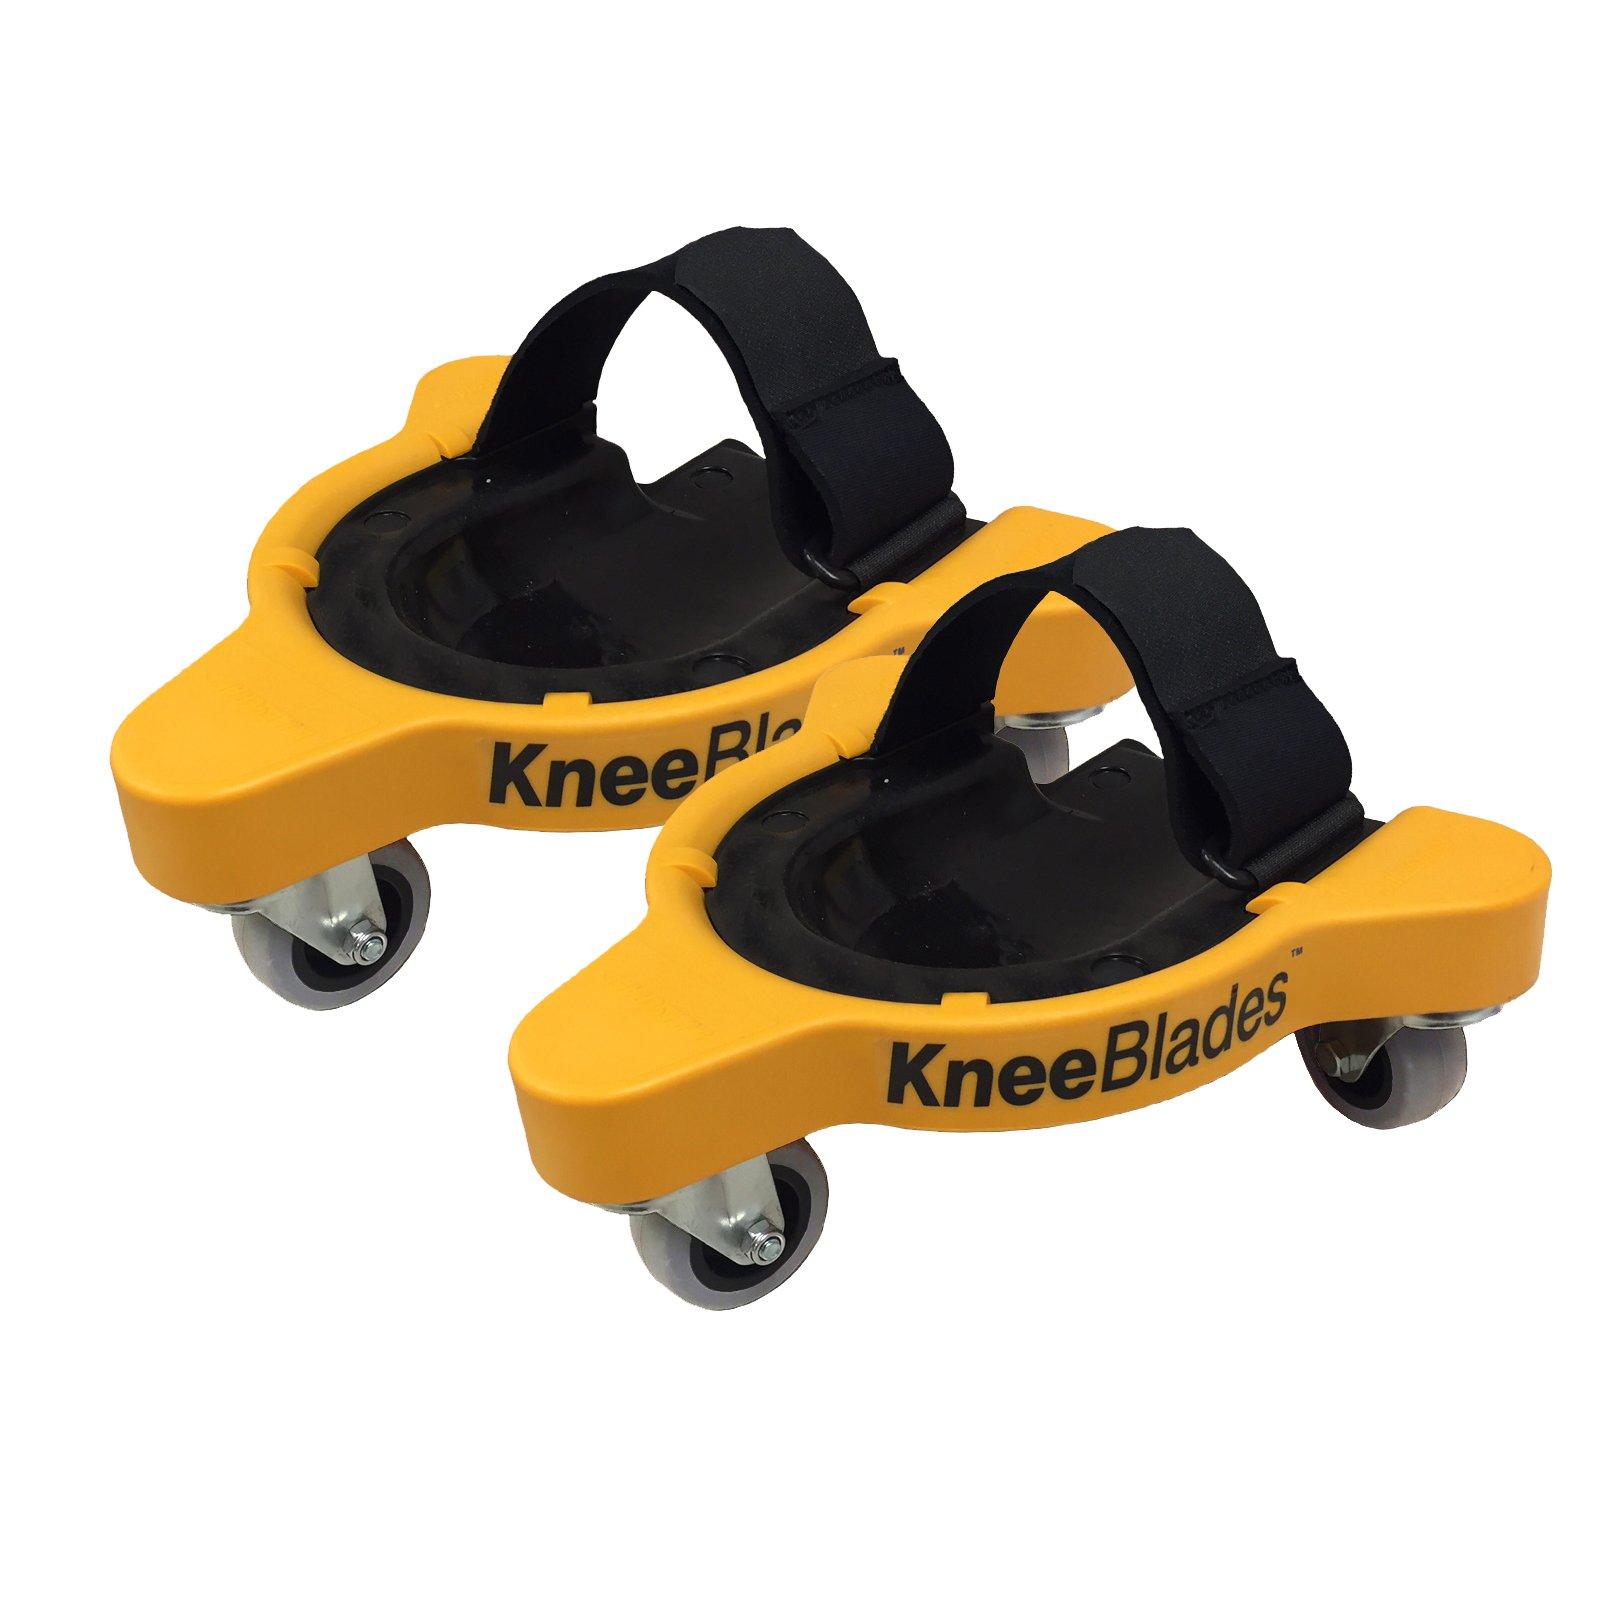 Milescraft 1603 KneeBlades - Rolling Knee Pads by Milescraft